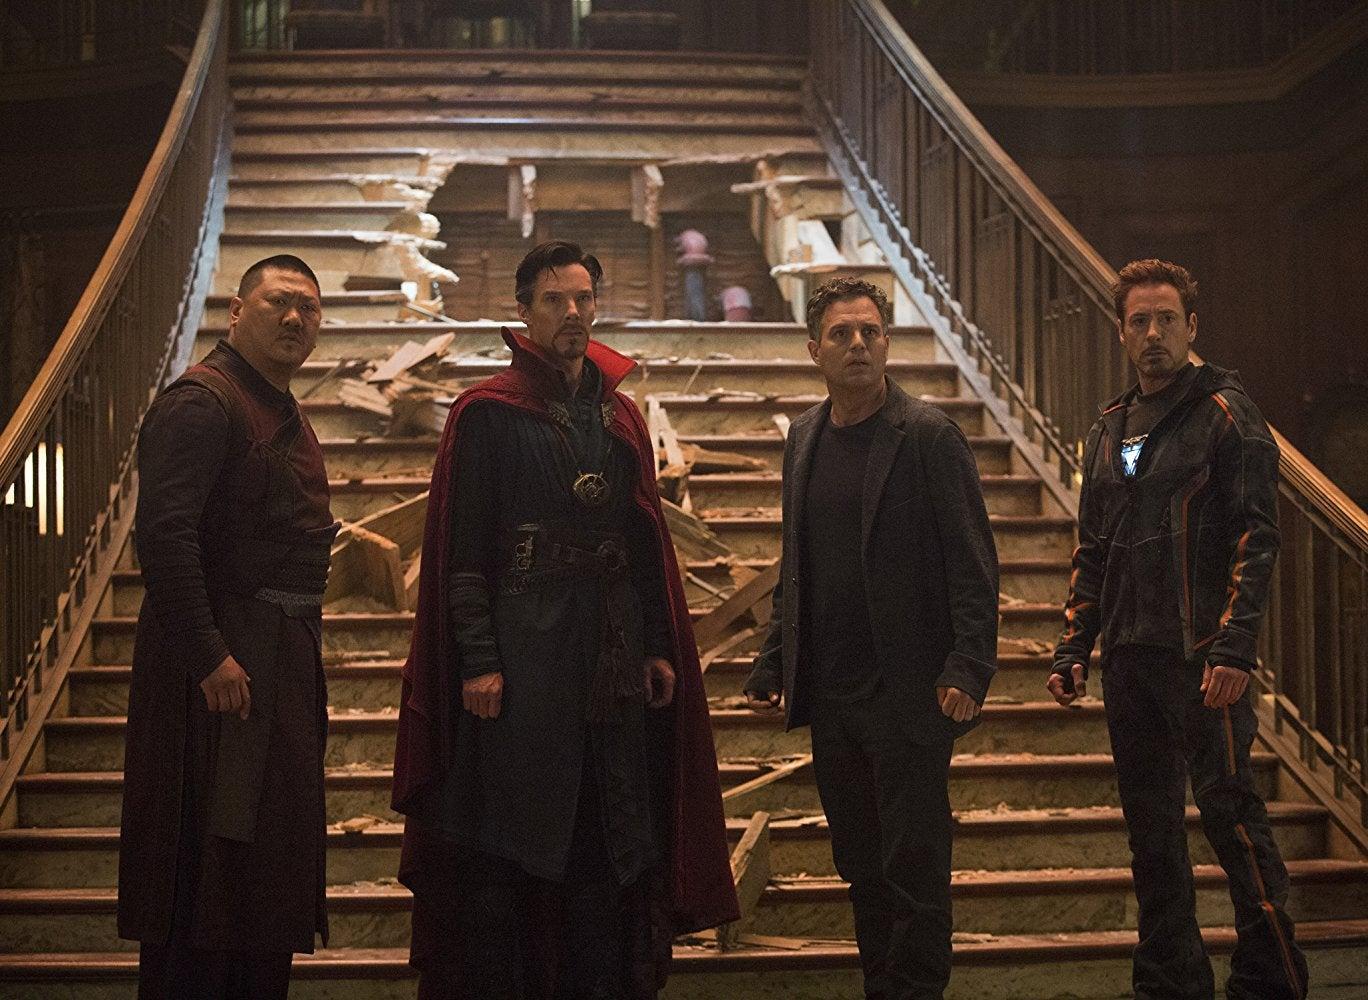 Benedict Wong, Benedict Cumberbatch, Mark Ruffalo, and Robert Downey Jr.